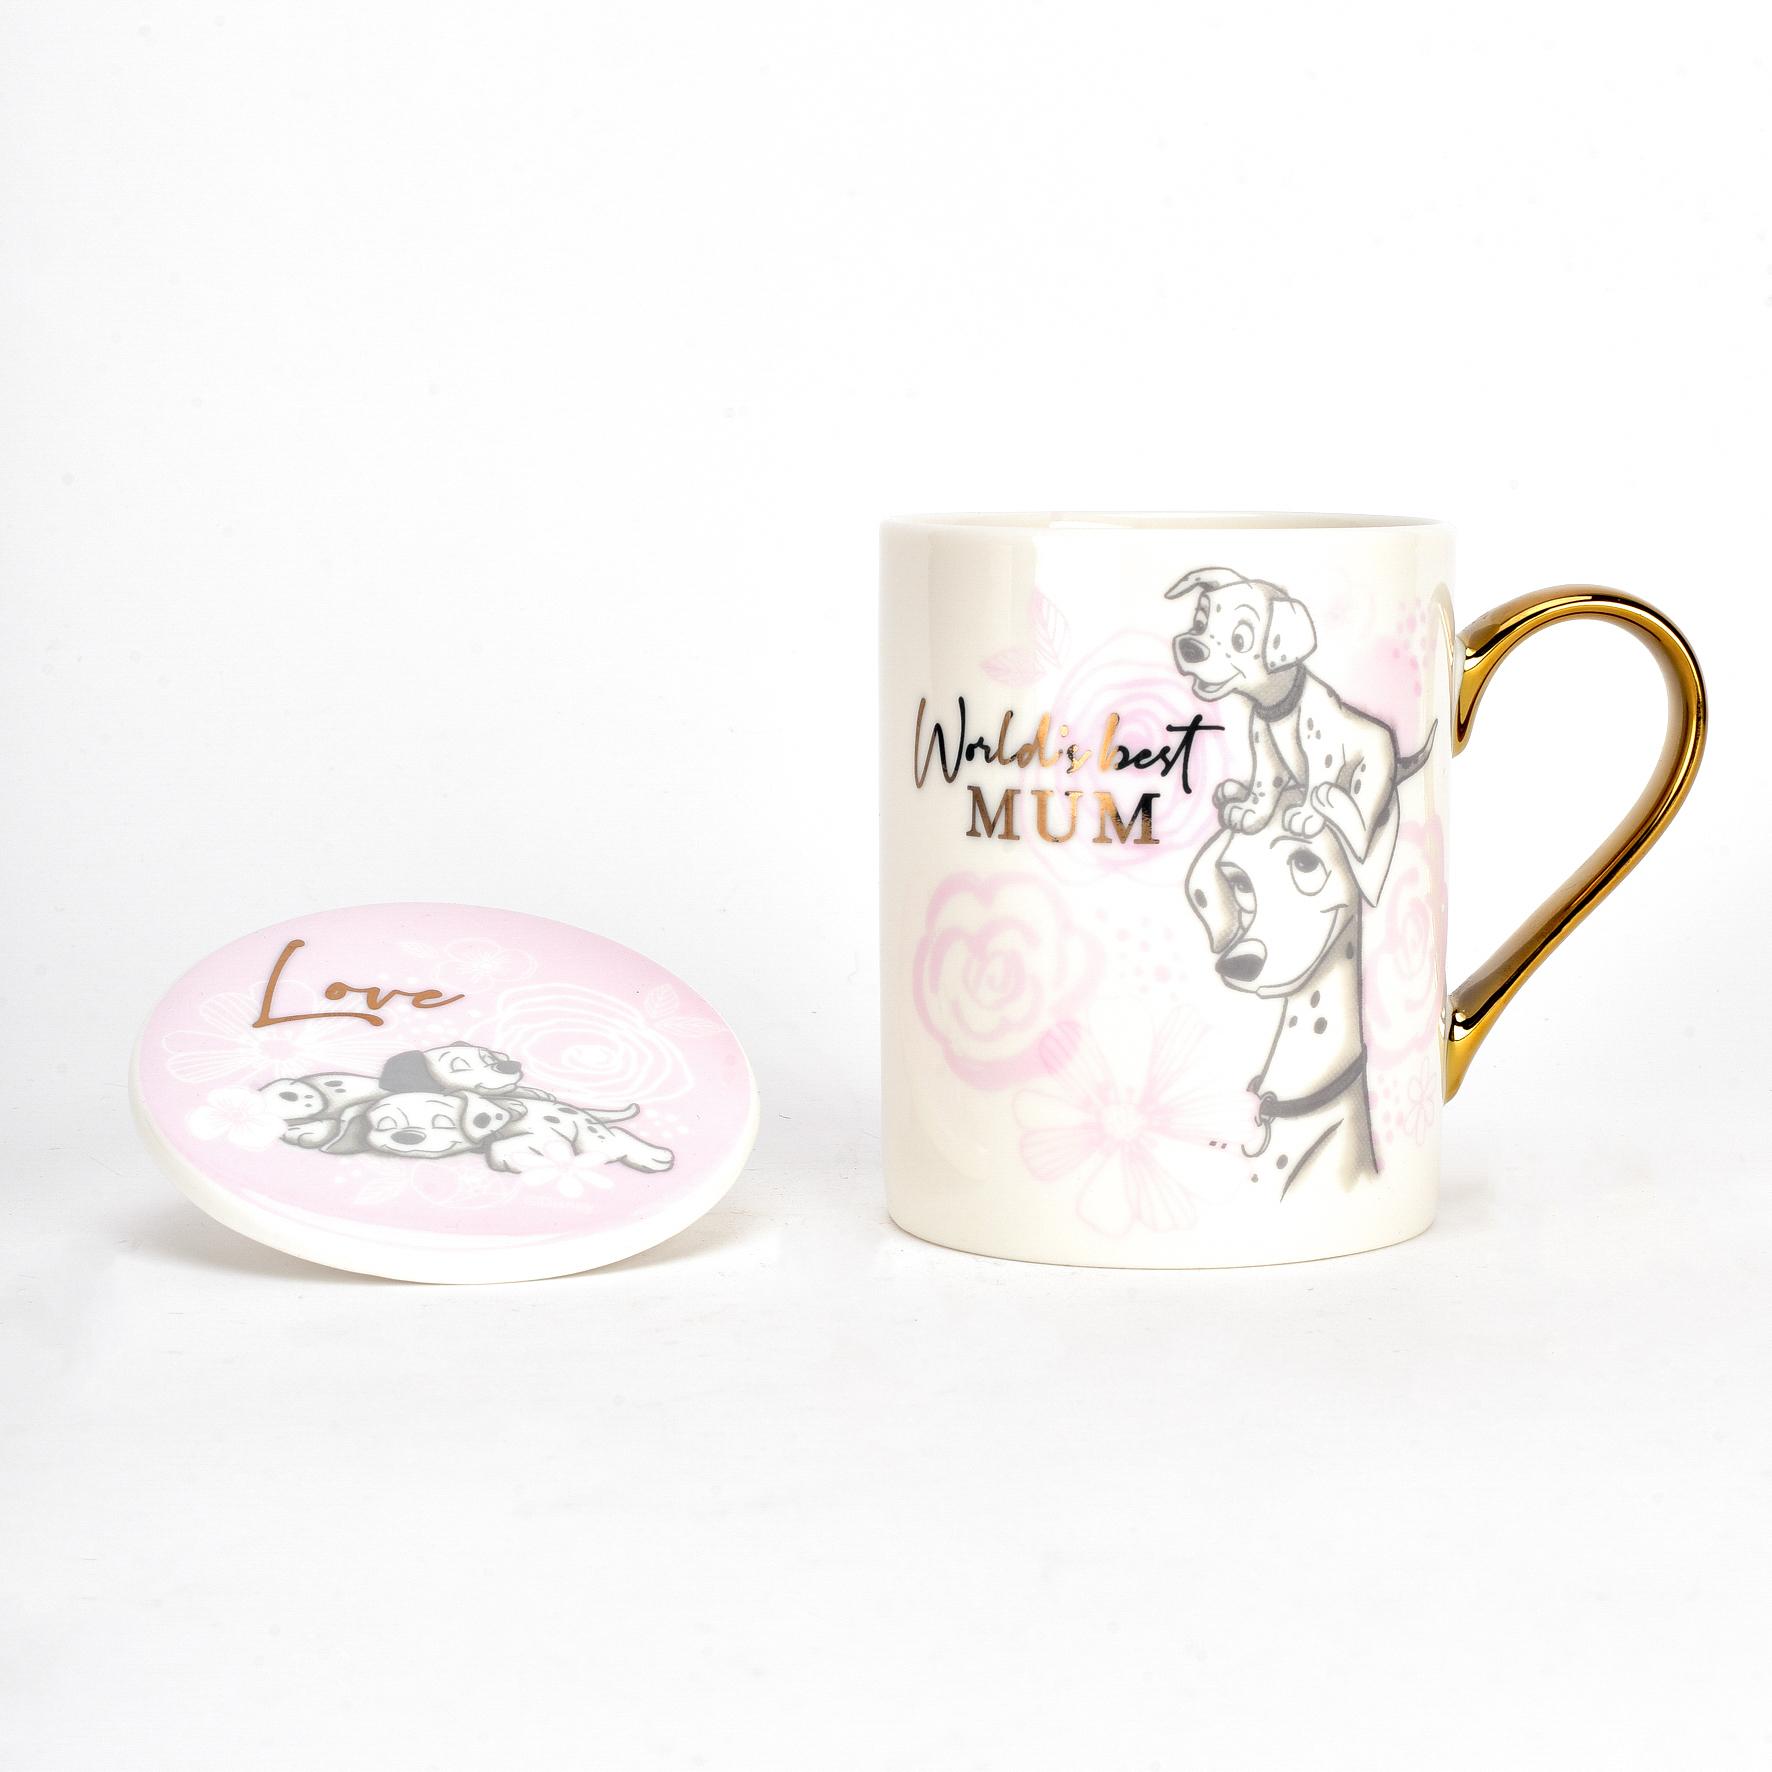 Disney Dalmatioans Gift Set - Mug & Coaster - Mum